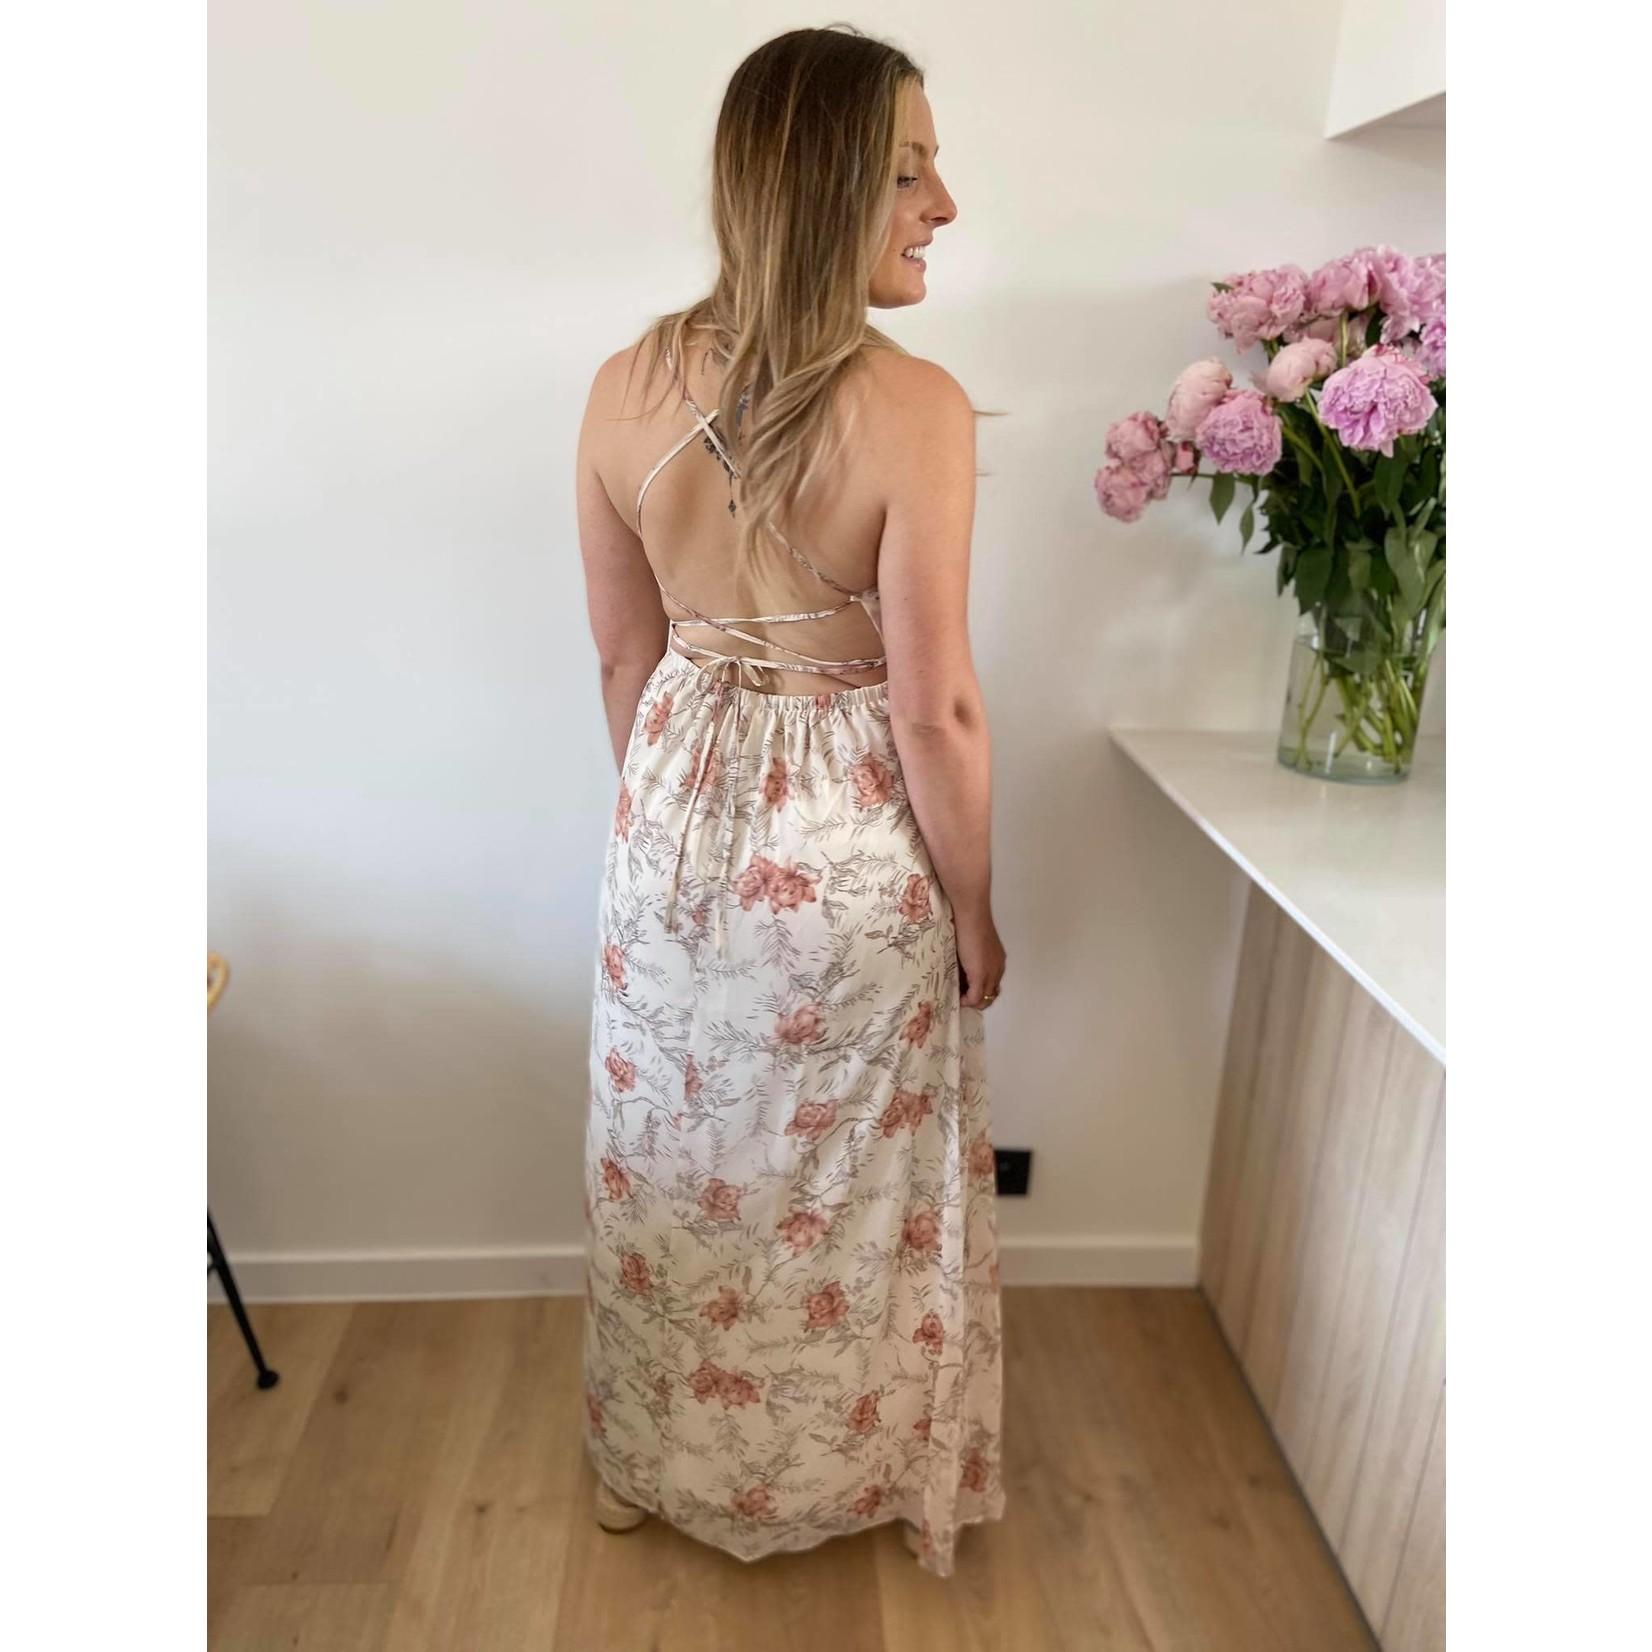 Vera maxi dress light flower